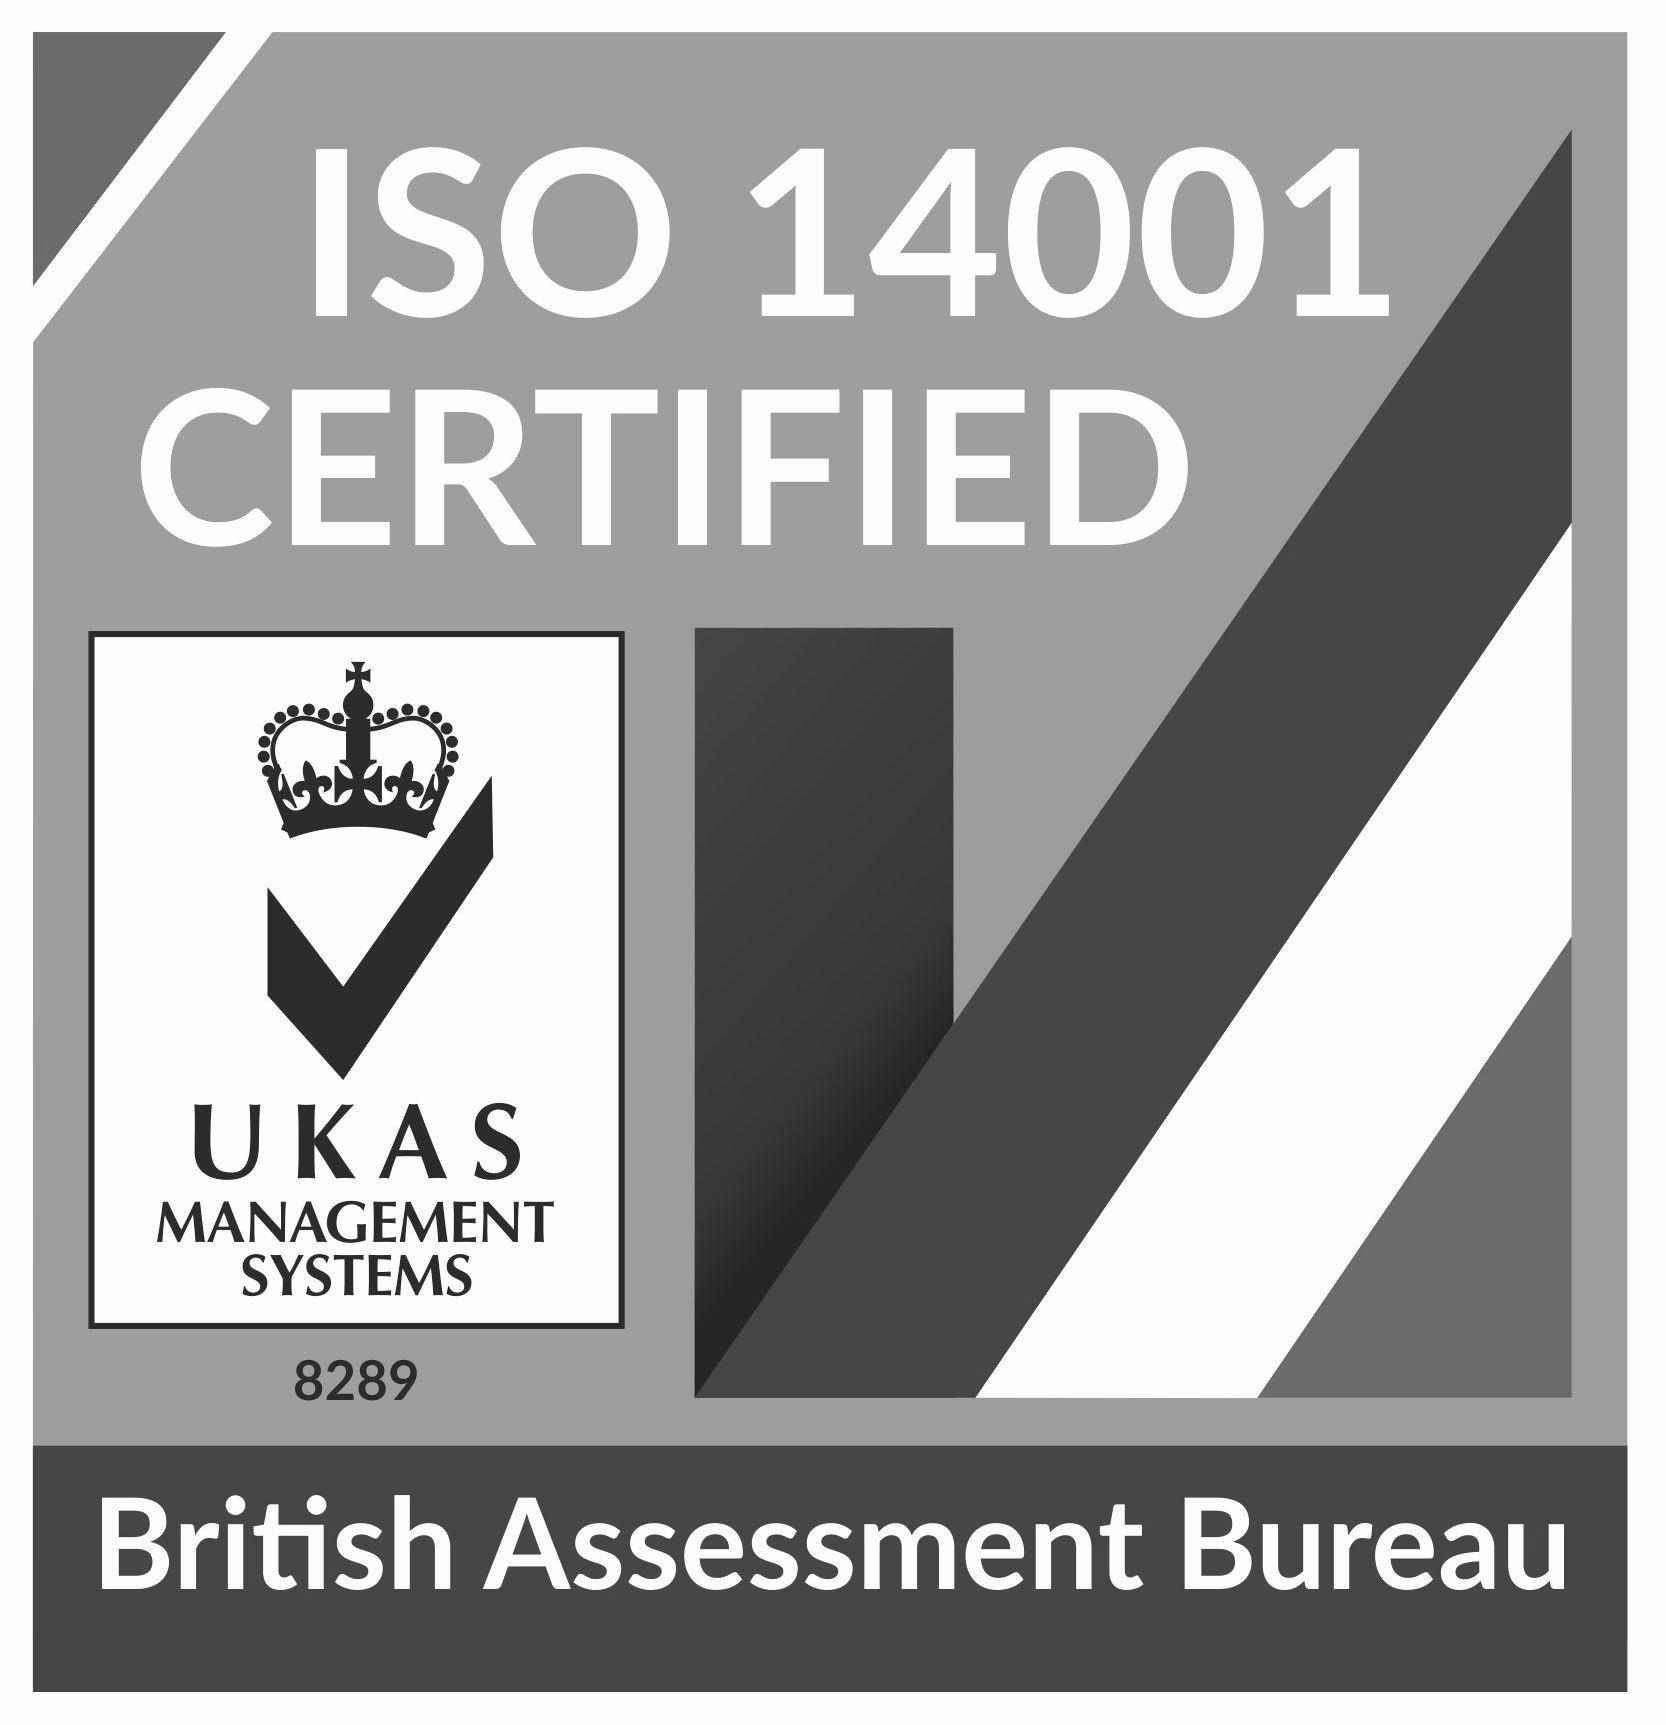 UKAS-ISO-14001(b&w)